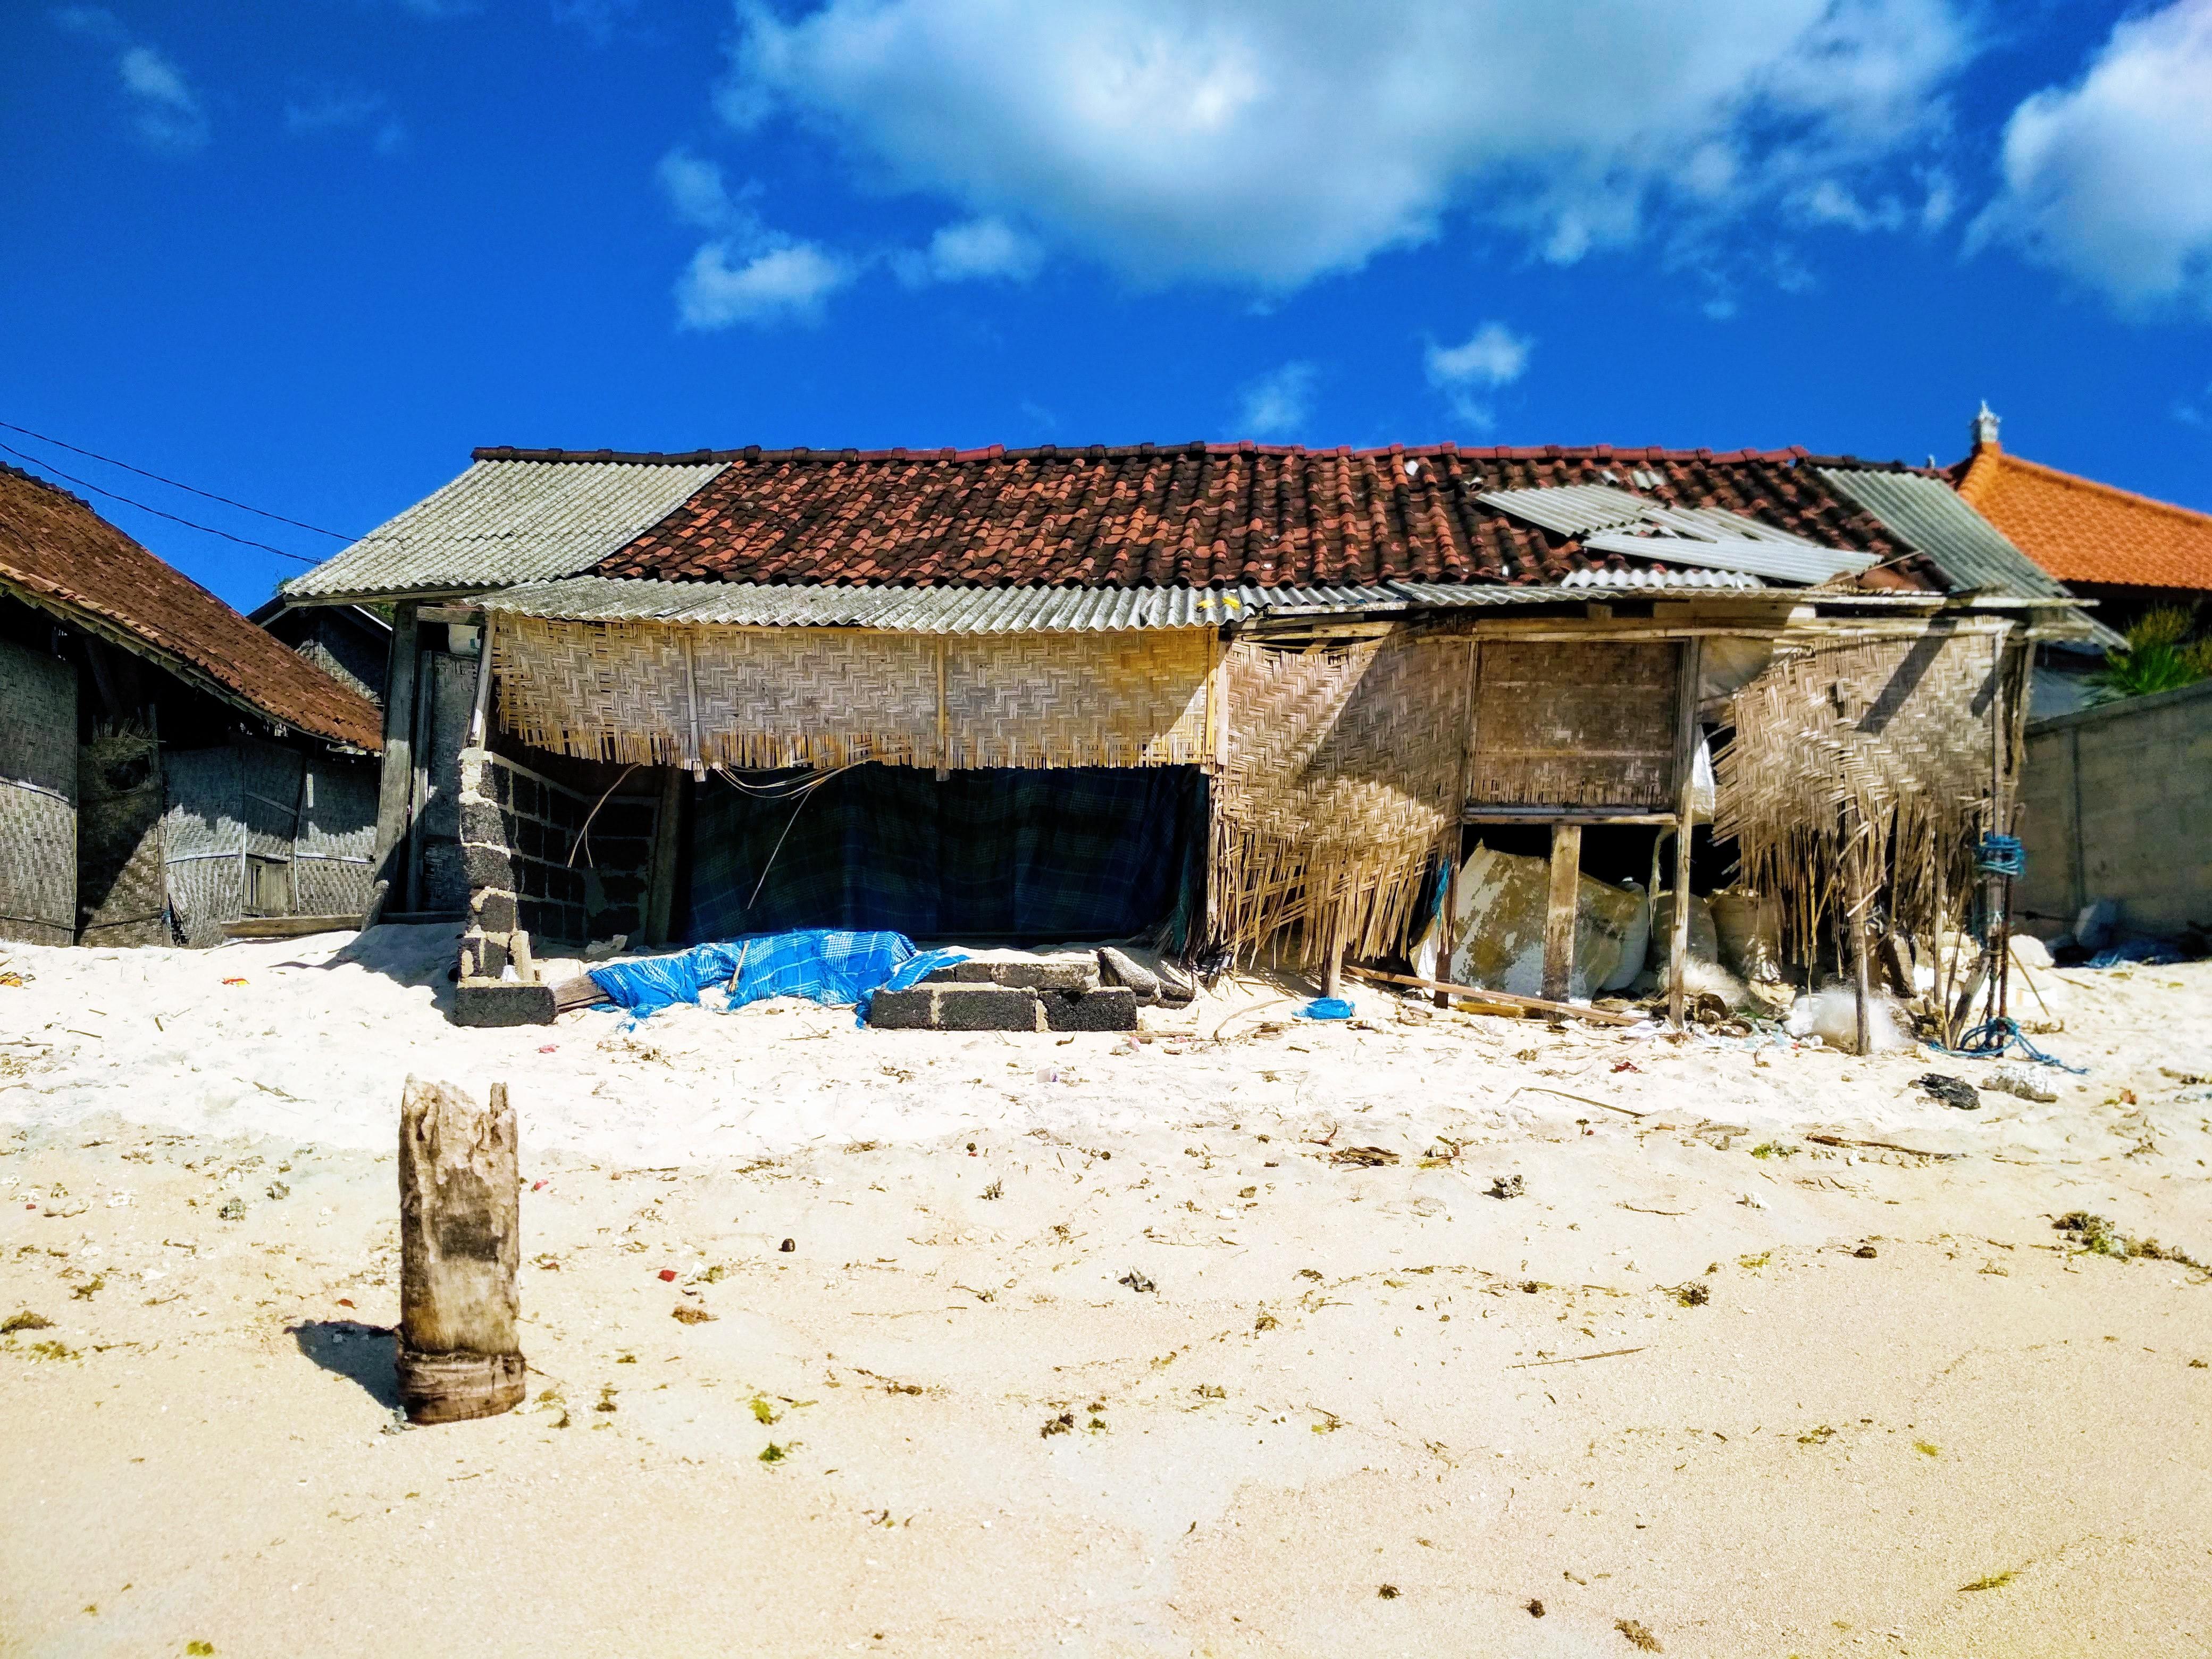 Pláže tu lemují polorozpadlé chýše © Filip Altman